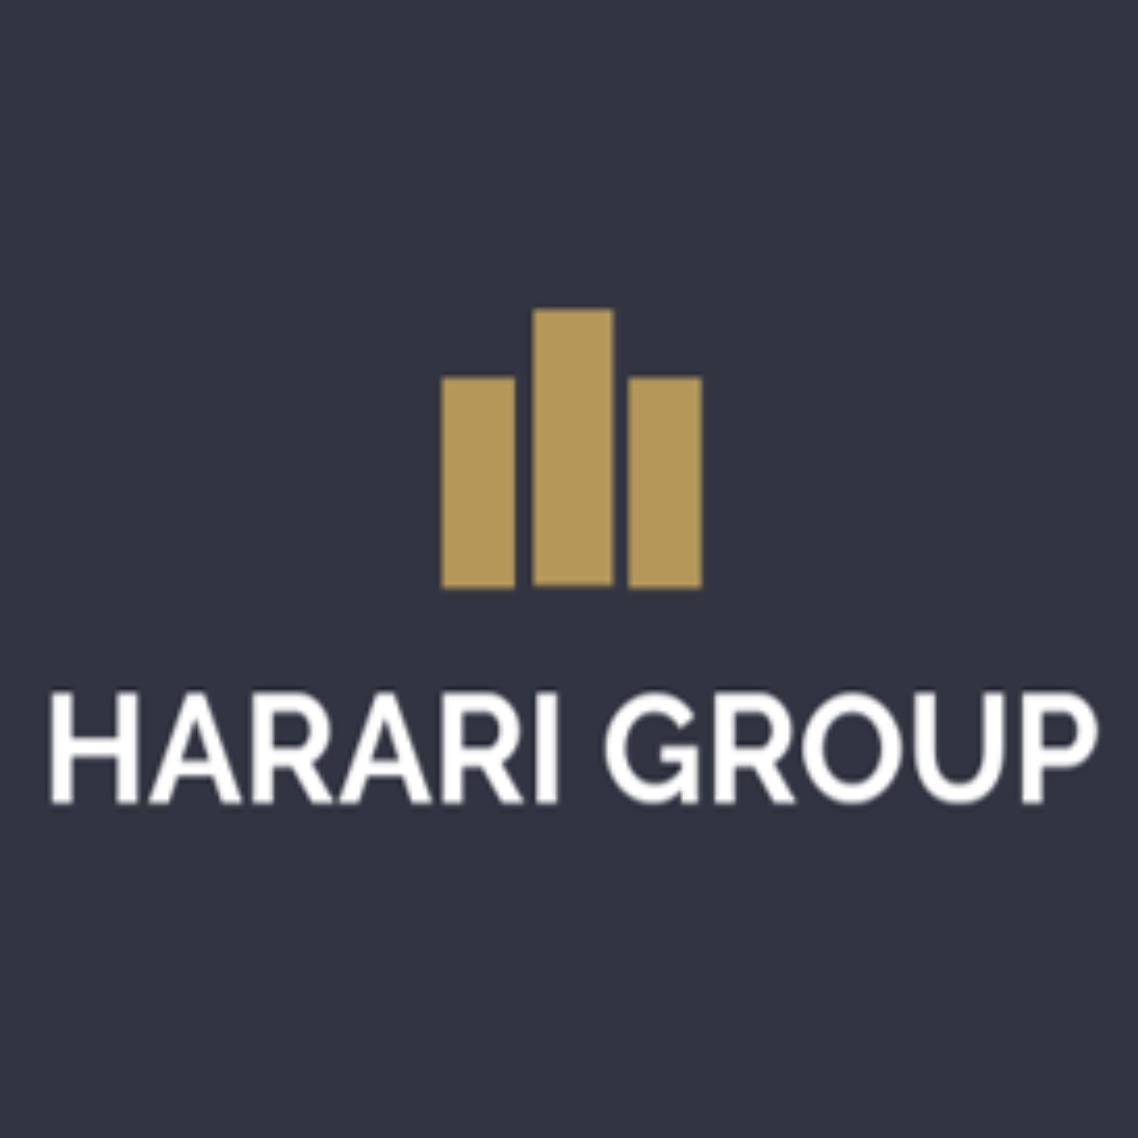 Harari Group